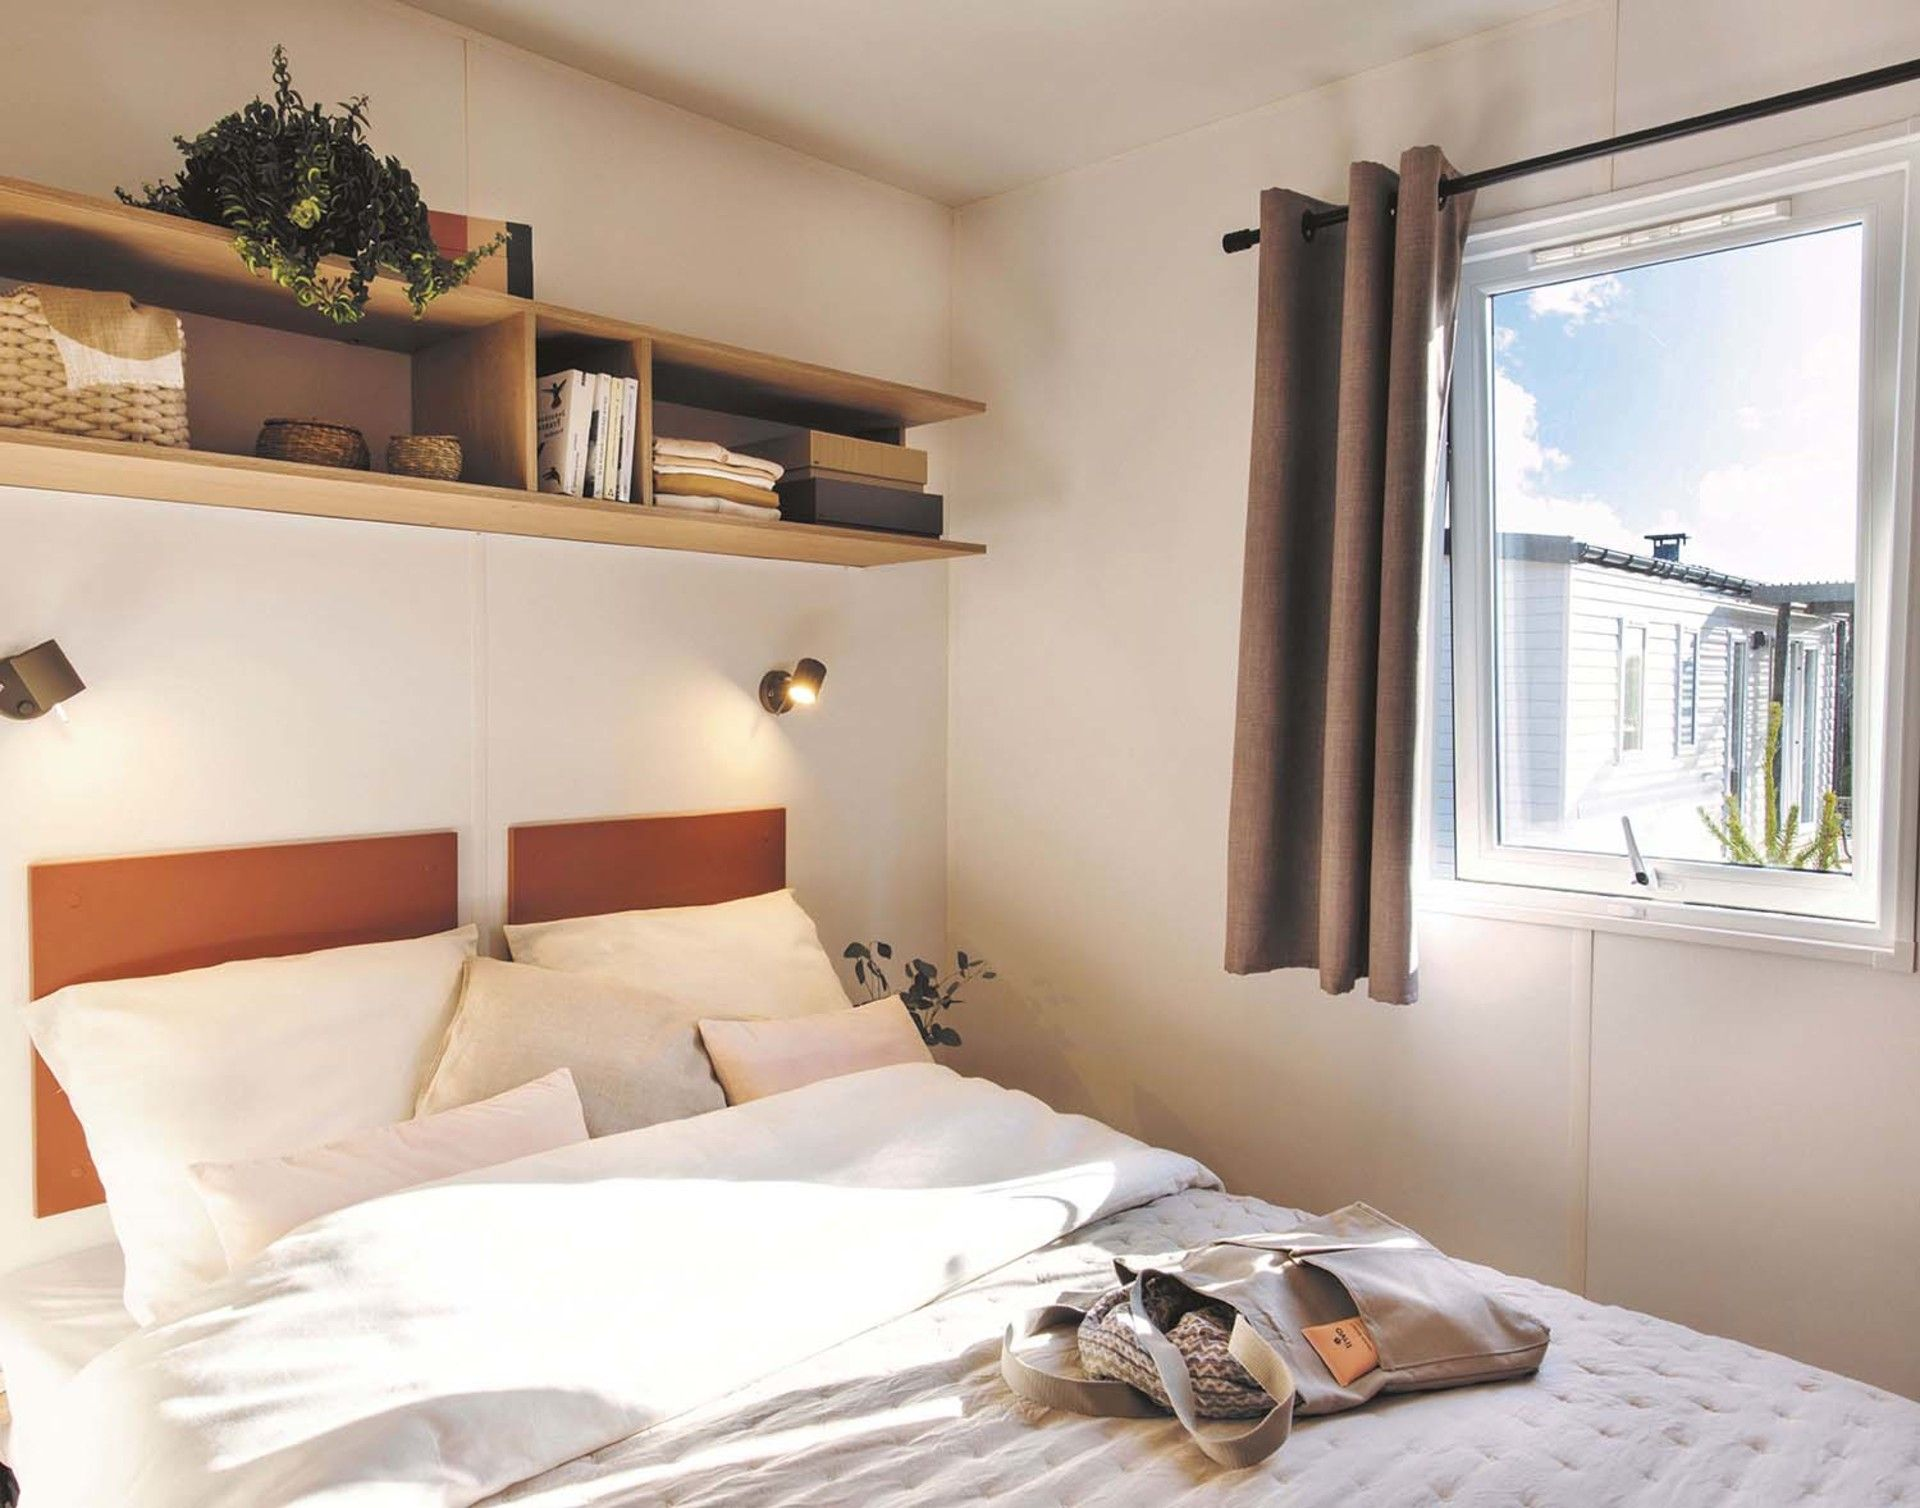 IRM AQUA 2 - 2022 - Mobil Home Neuf - Zen Mobil homes